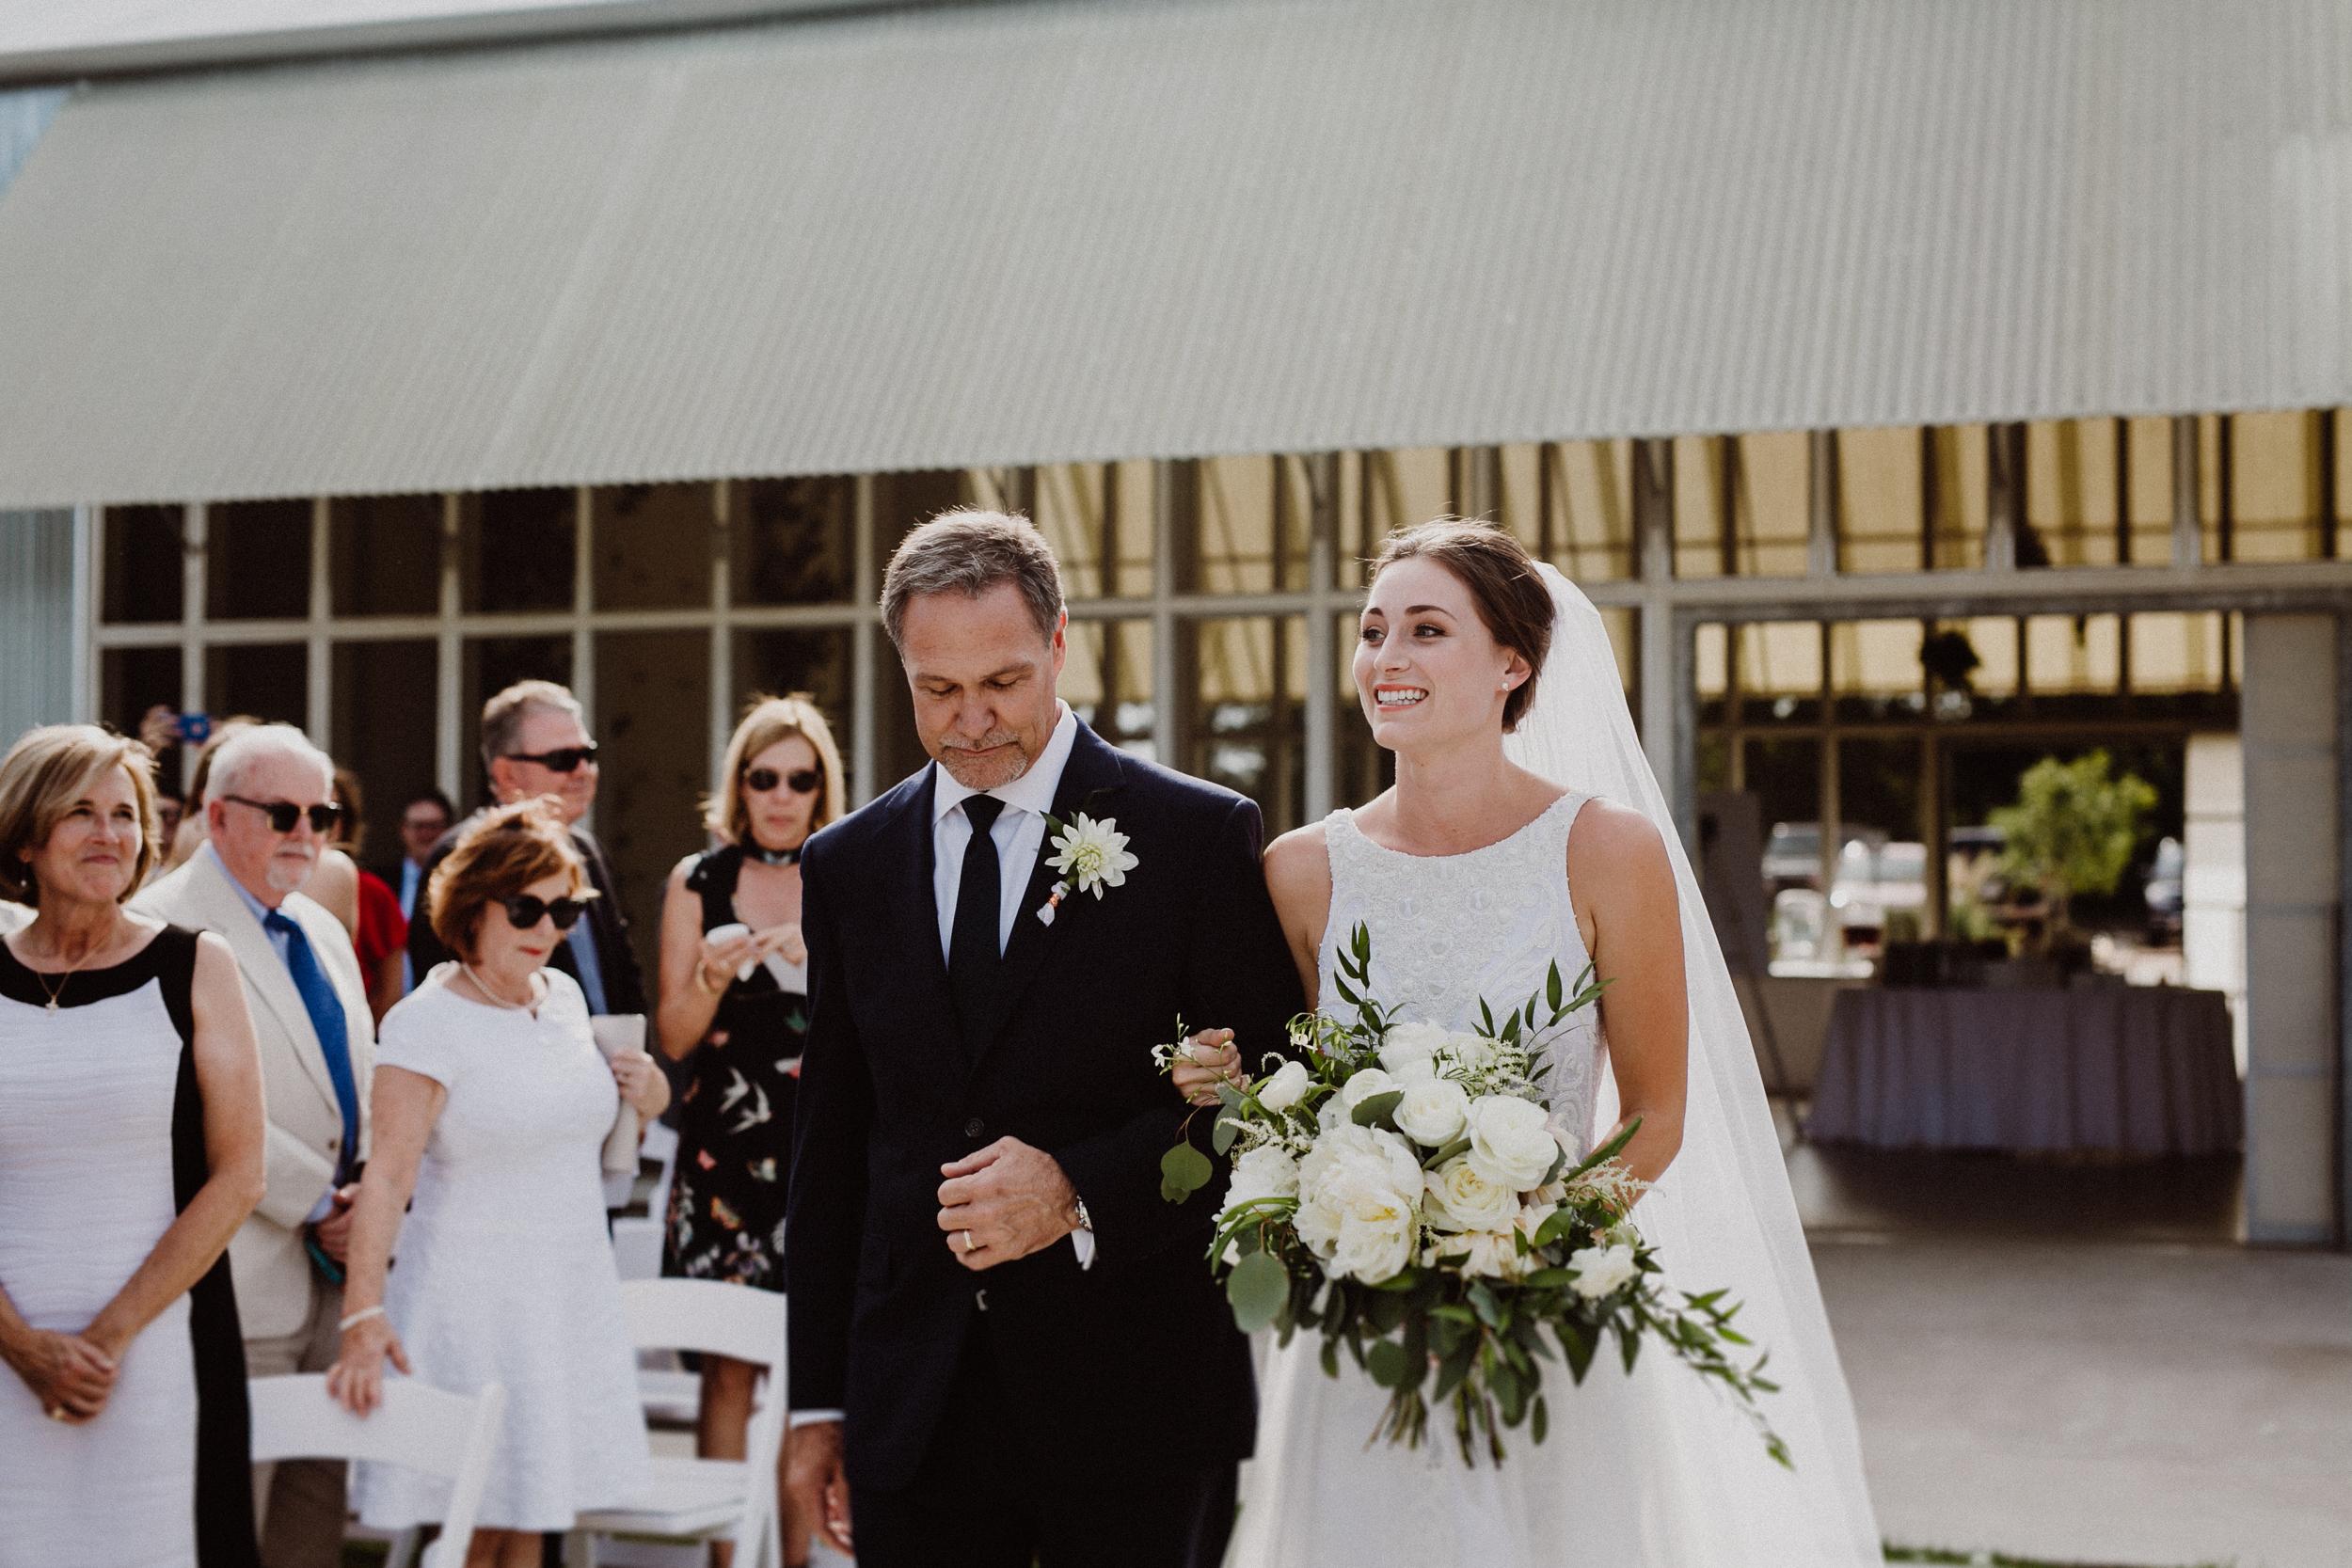 prospect-house-wedding-S&AC-506.jpg